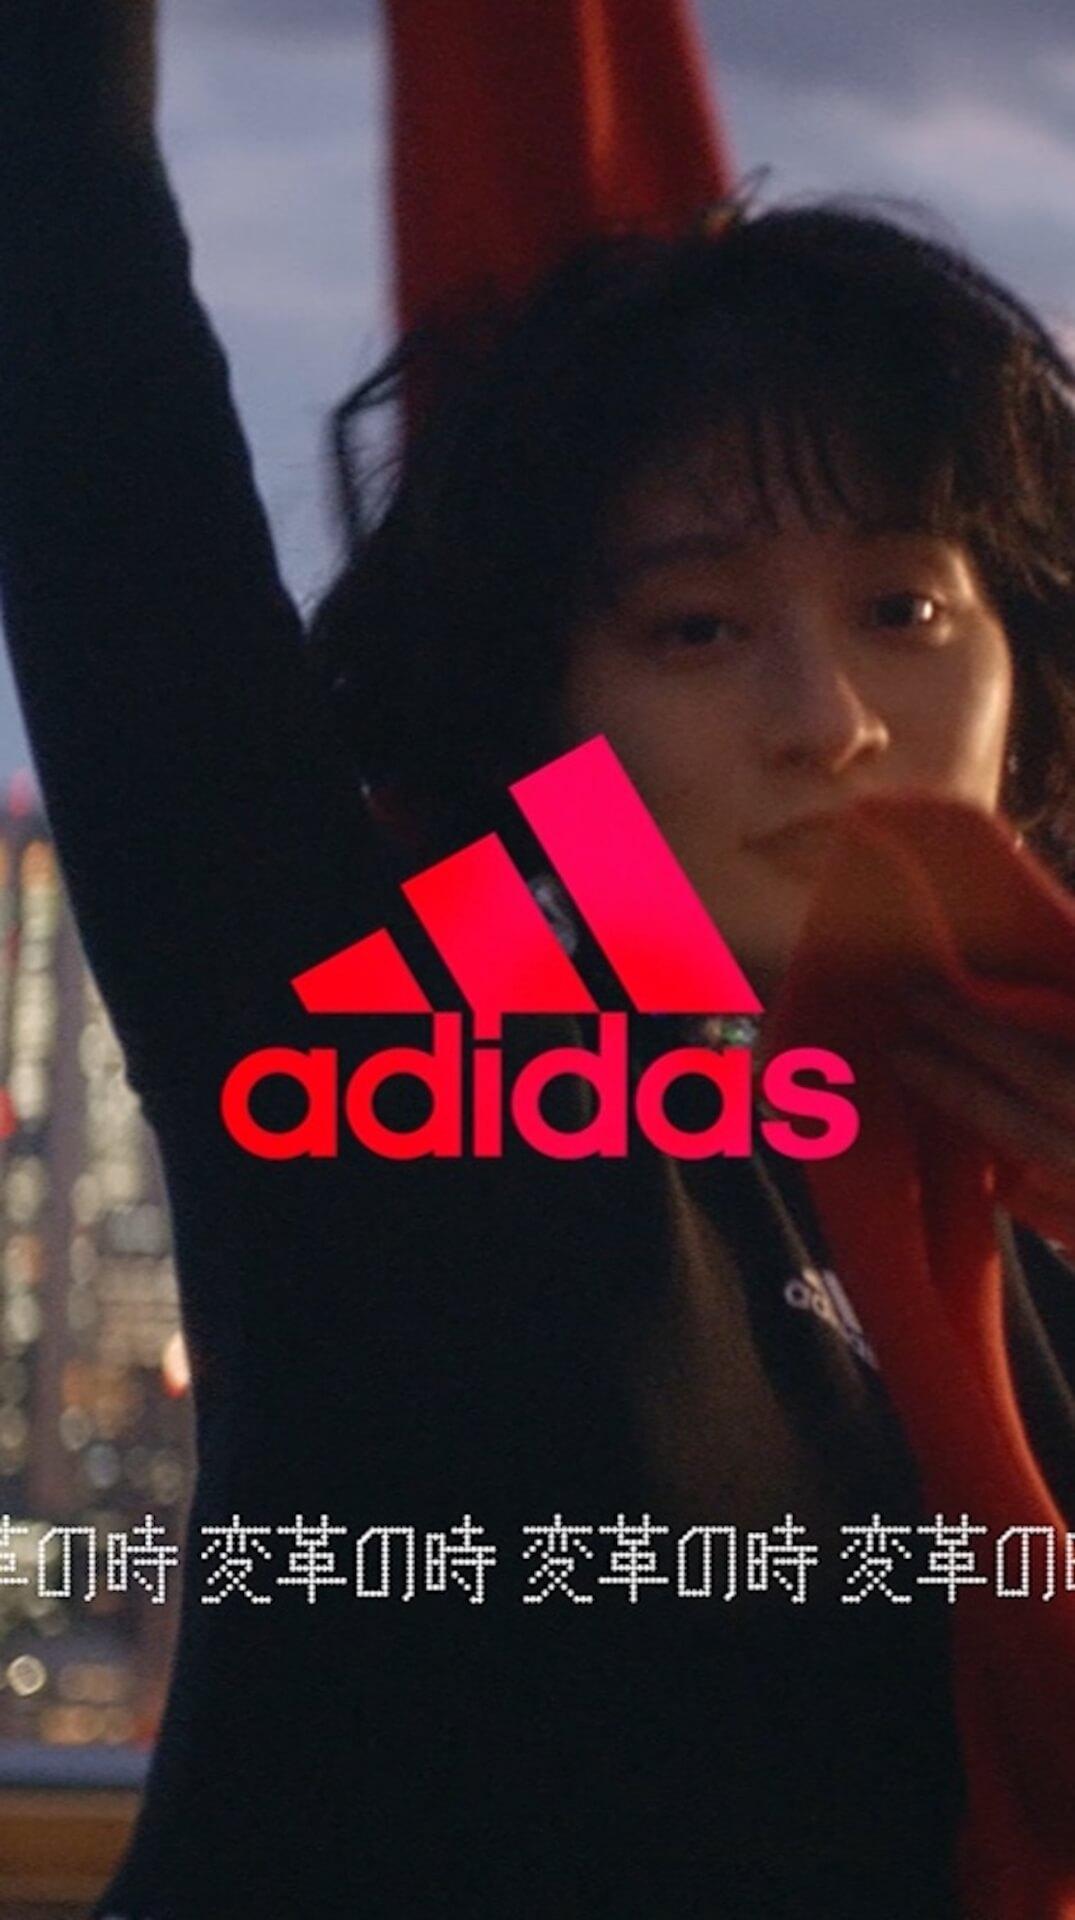 「adidas Athletics」SS20コレクションが発売!キャンペーンビジュアルを務めるコムアイのイメージフィルム本日公開 lf200206_addidasathletics_05